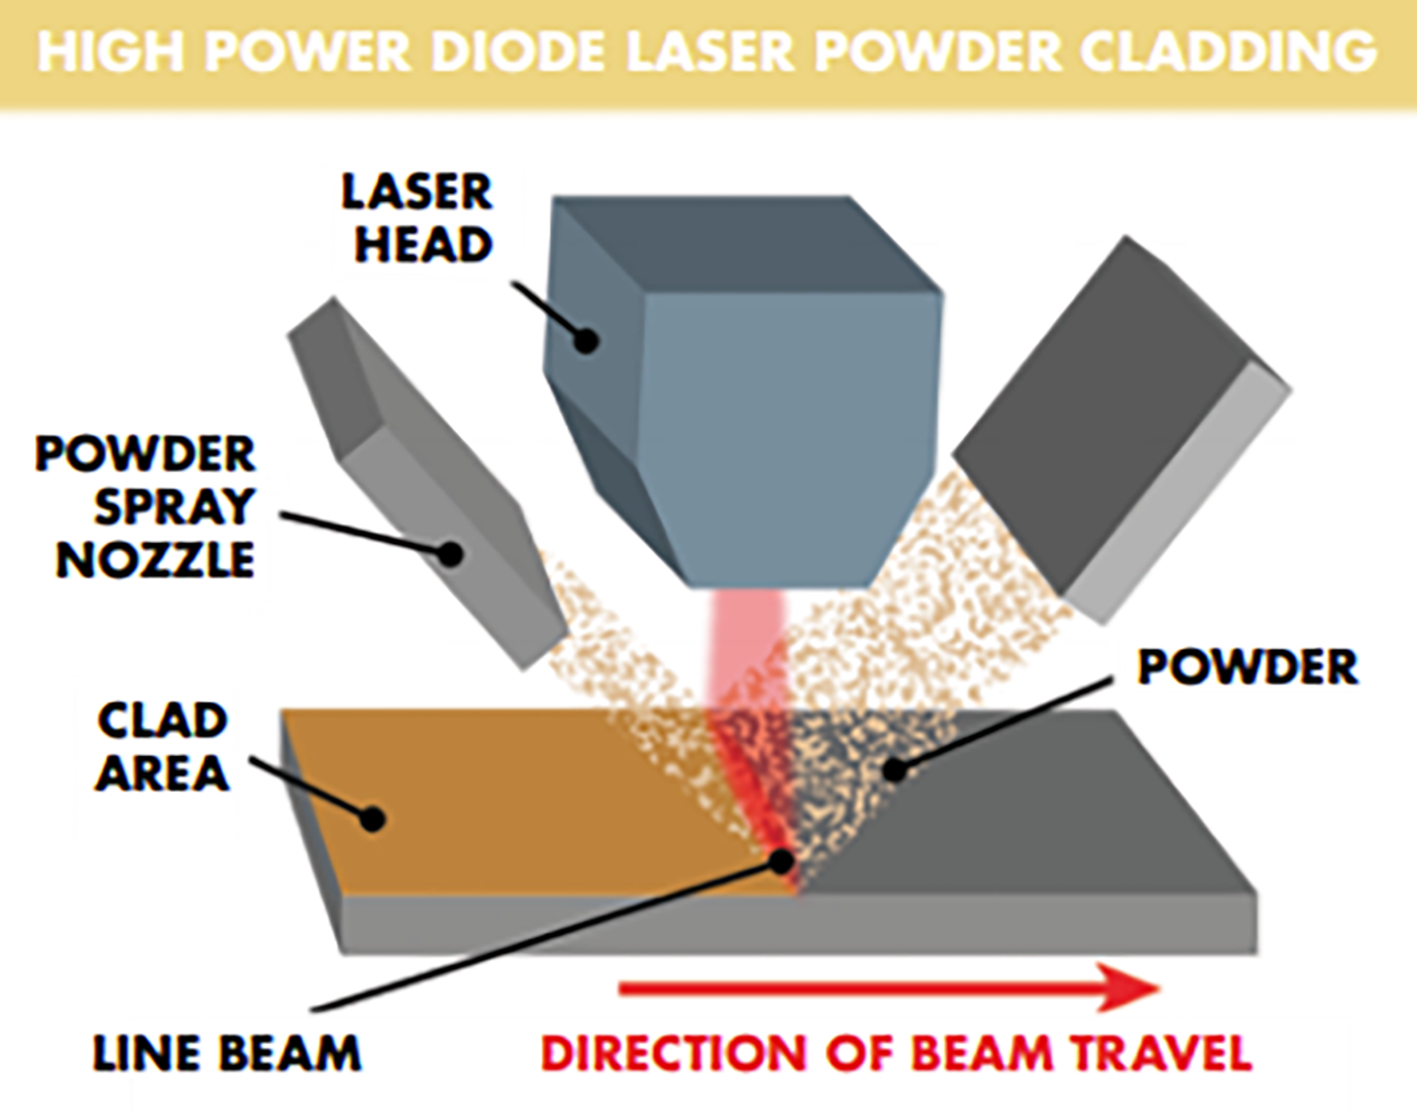 High Power Diode Laser Powder Cladding